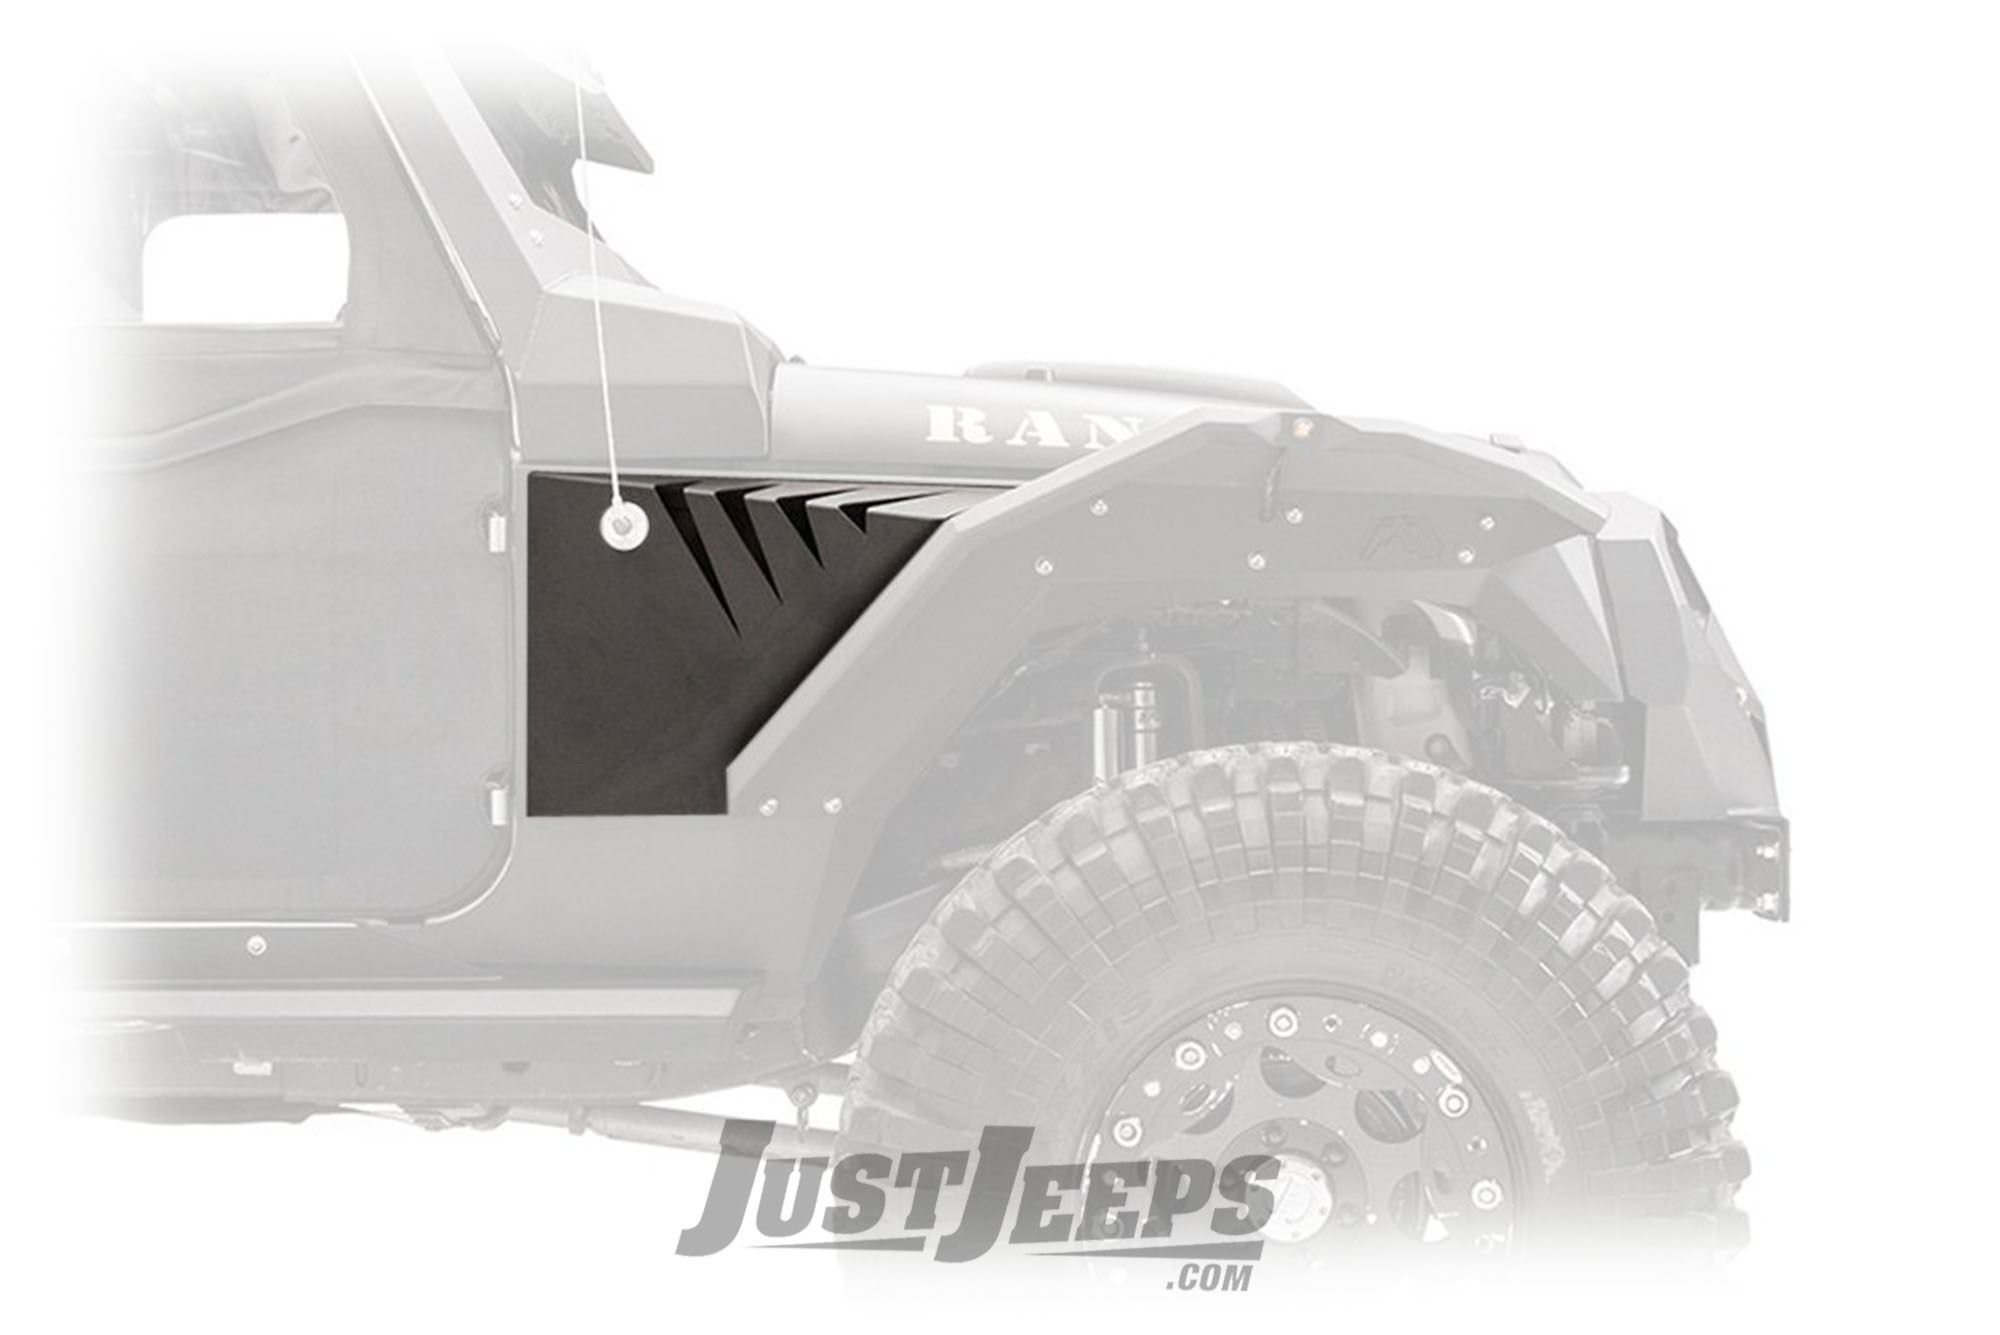 Fab Fours Front Fender Gill Box For 2007-18+ Jeep Gladiator JT & Wrangler JK/JL 2 Door & Unlimited 4 Door Models